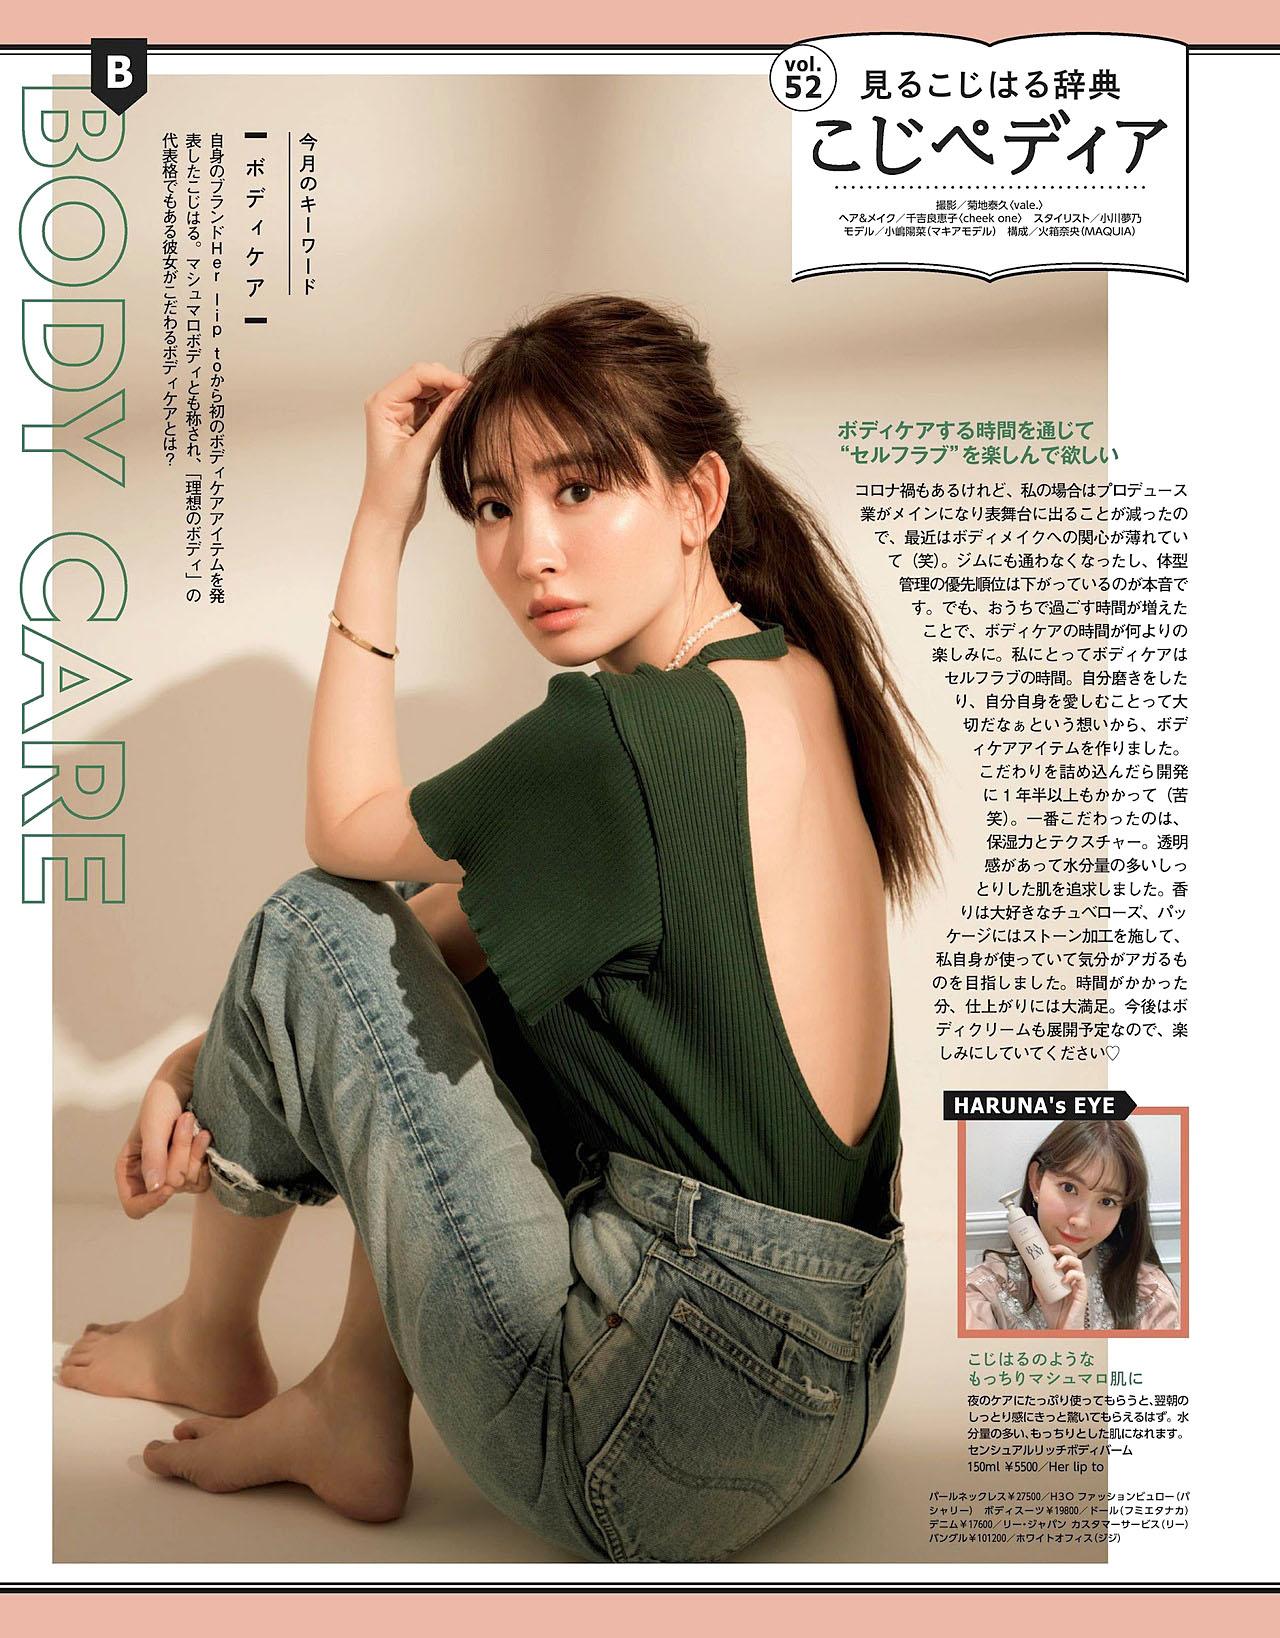 HKojima AR 2106 01.jpg